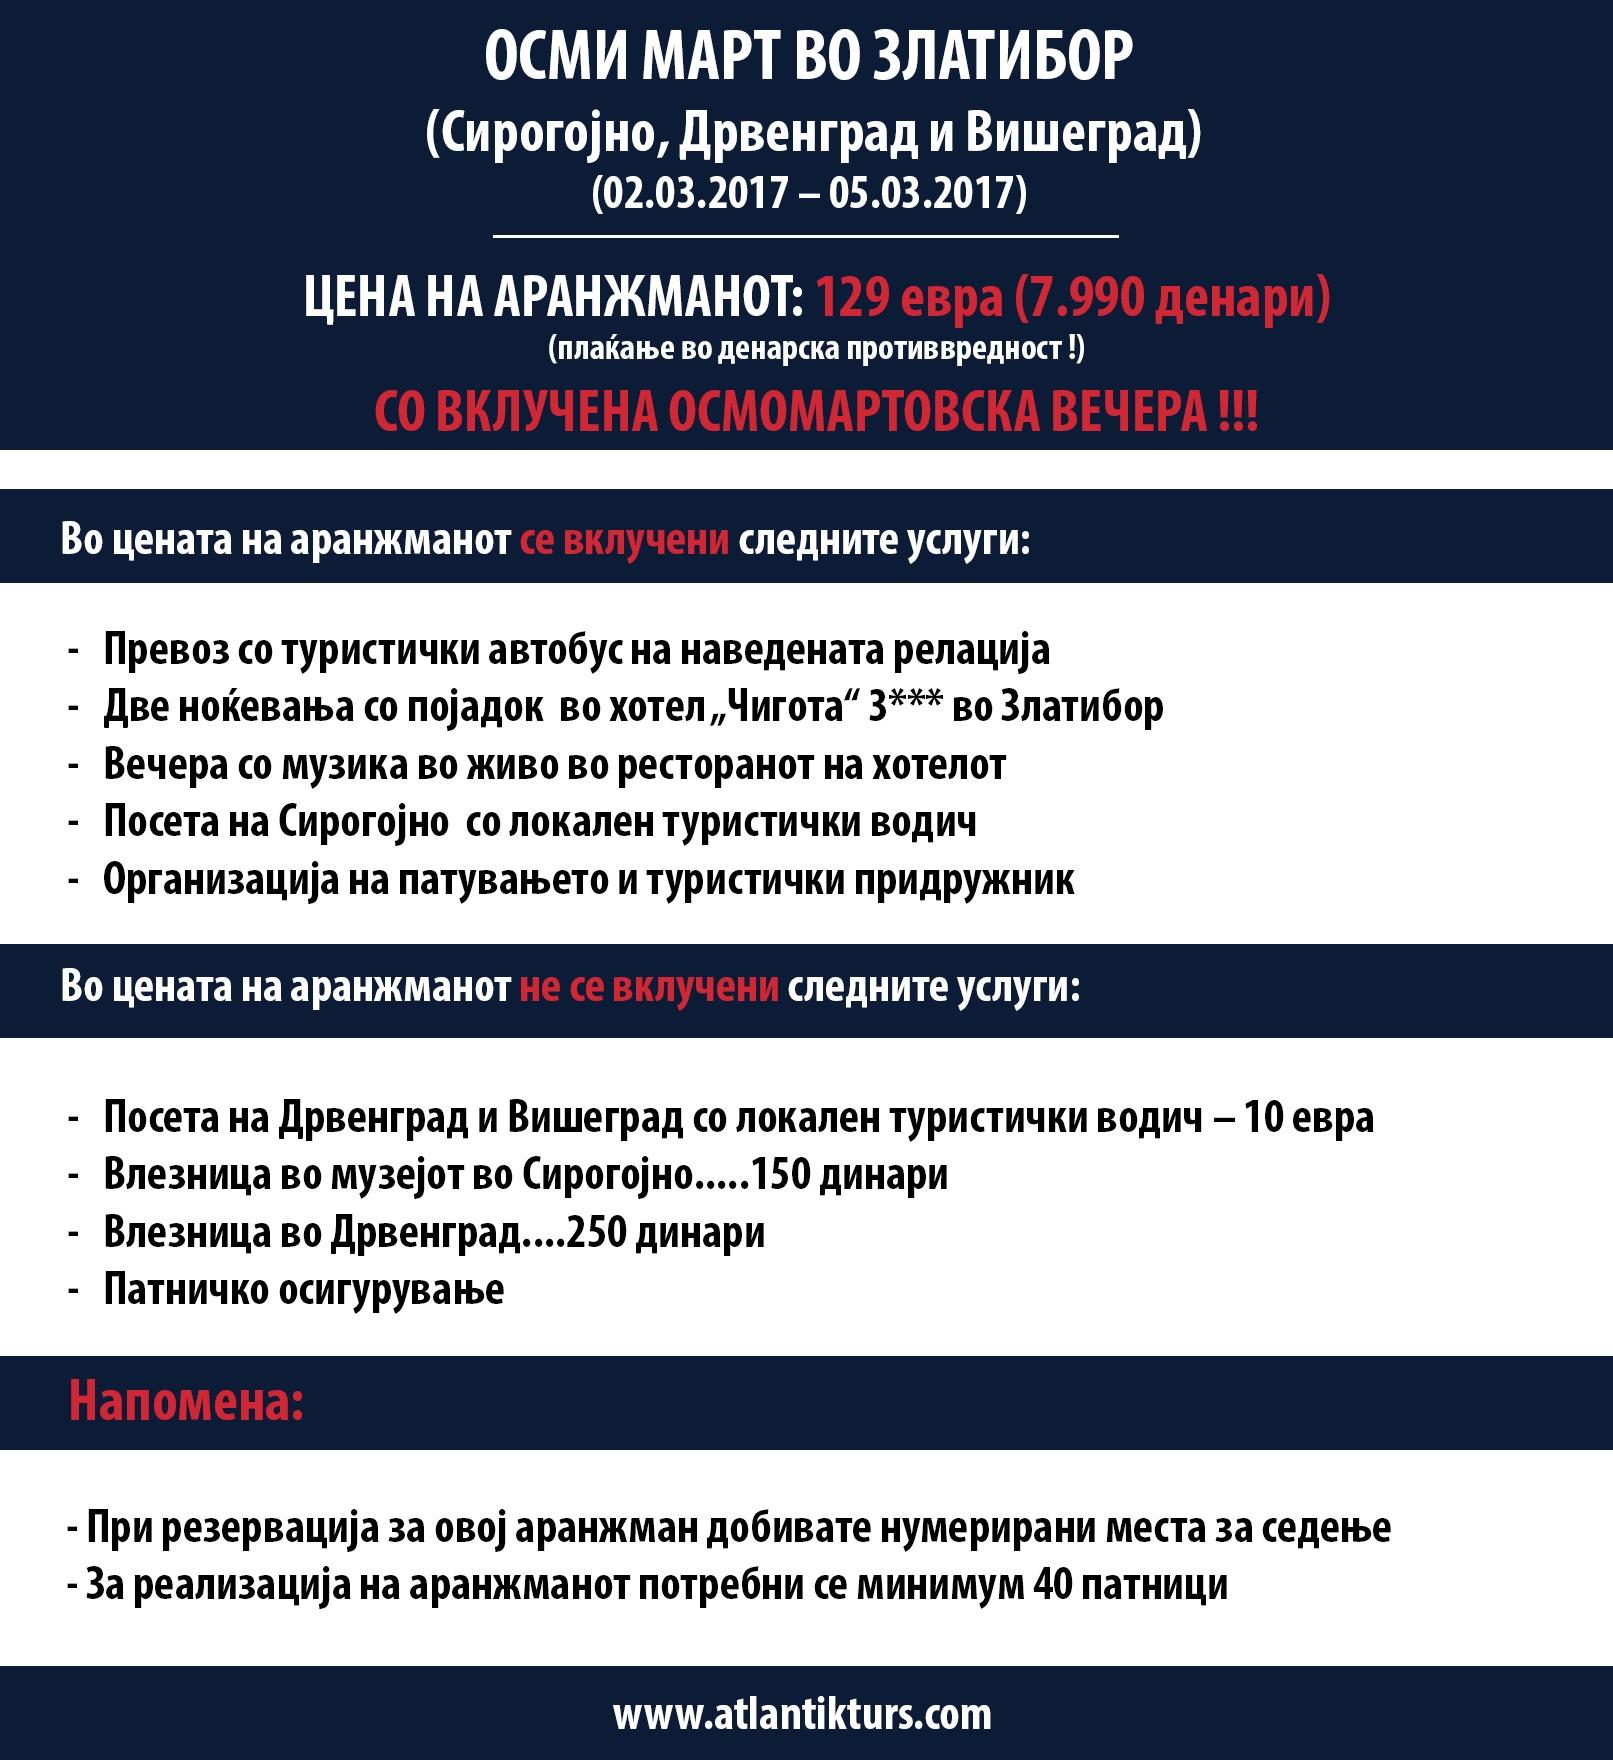 8 Март 2017 - Златибор